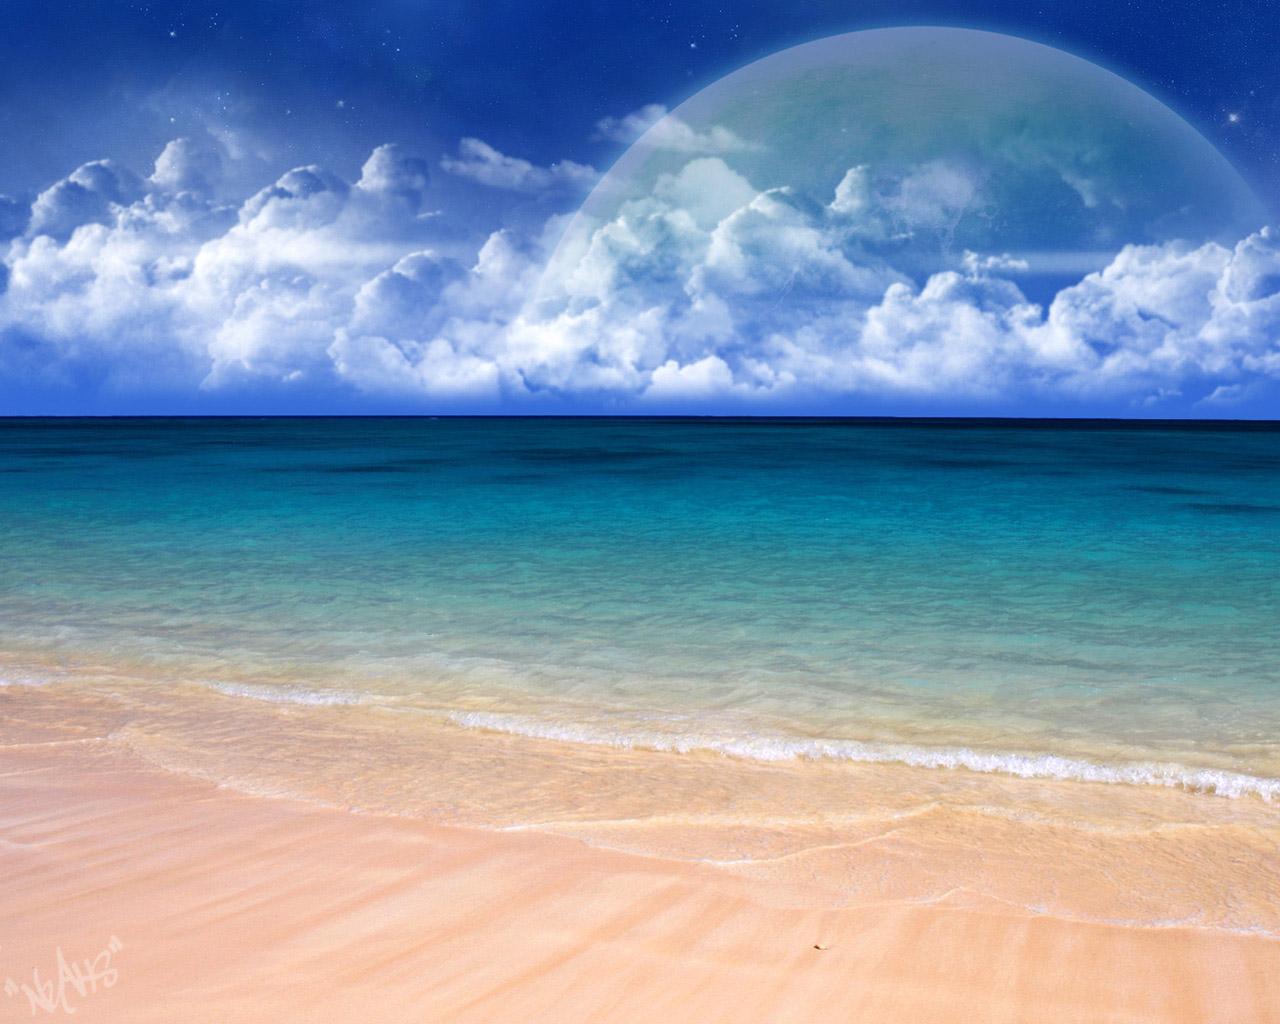 Clean Sea Water Wallpapers   HD Wallpapers 24613 1280x1024